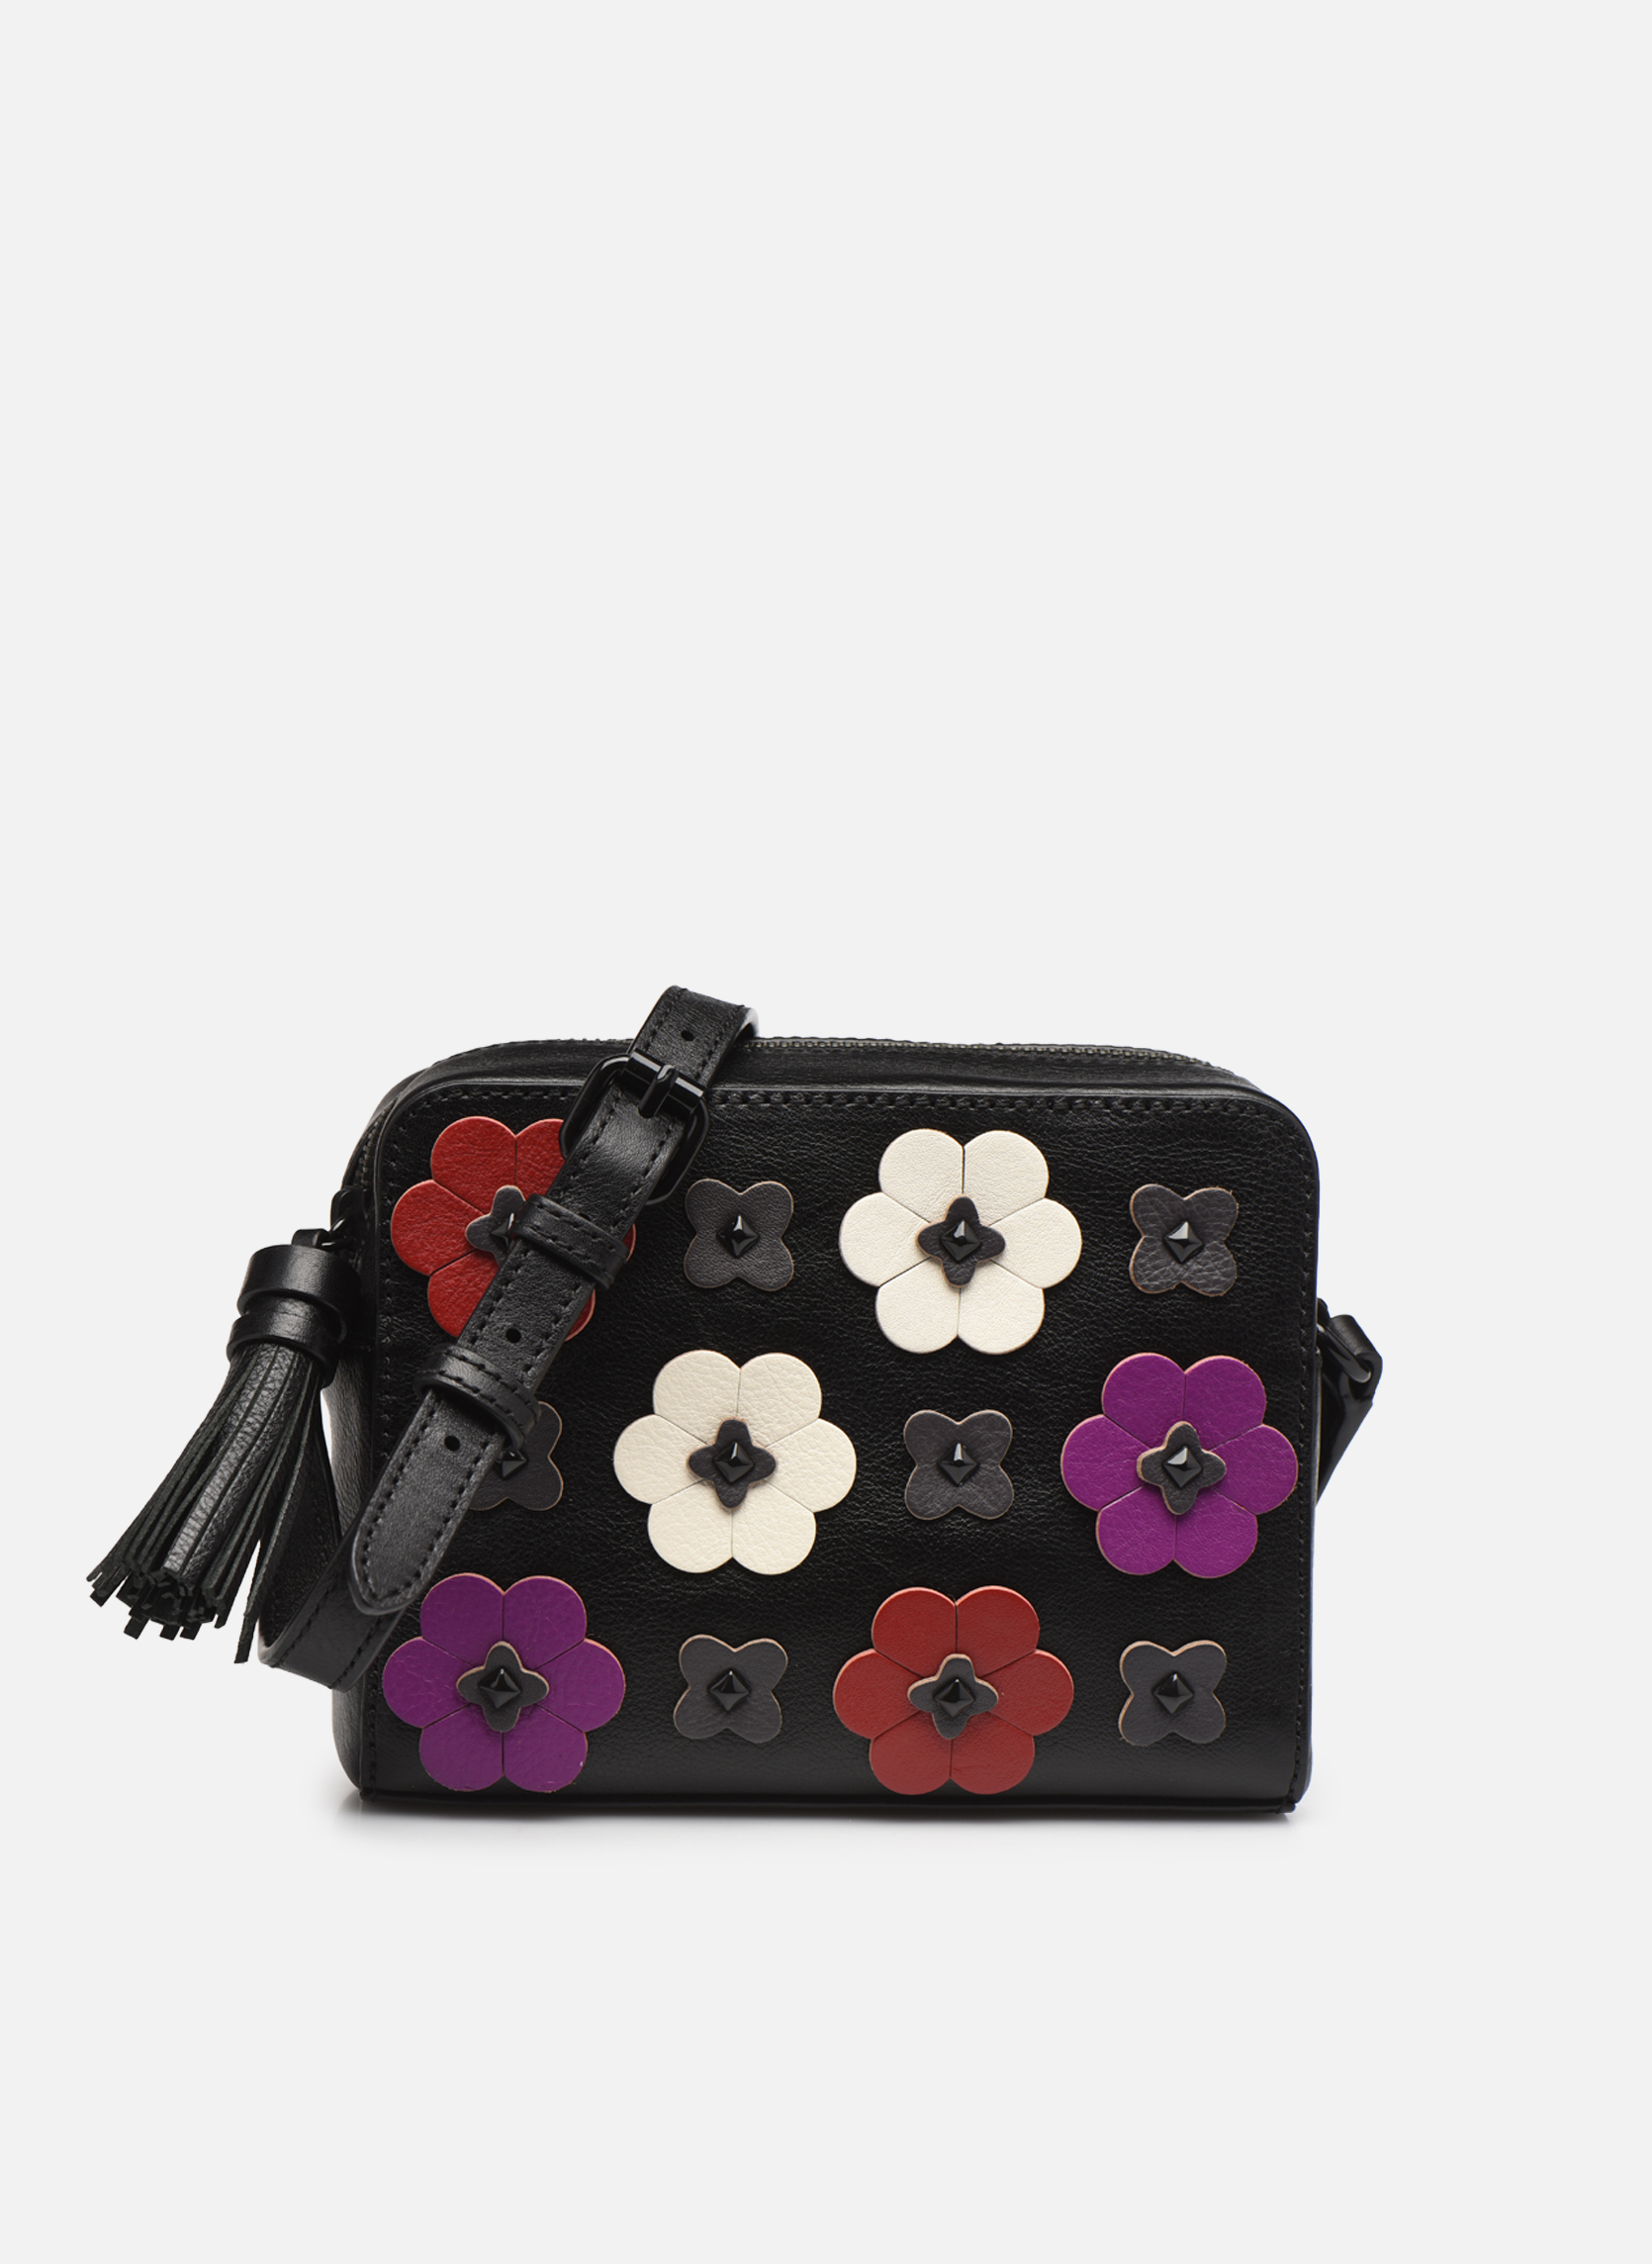 Sacs à main Sacs Floral Applique Camera bag